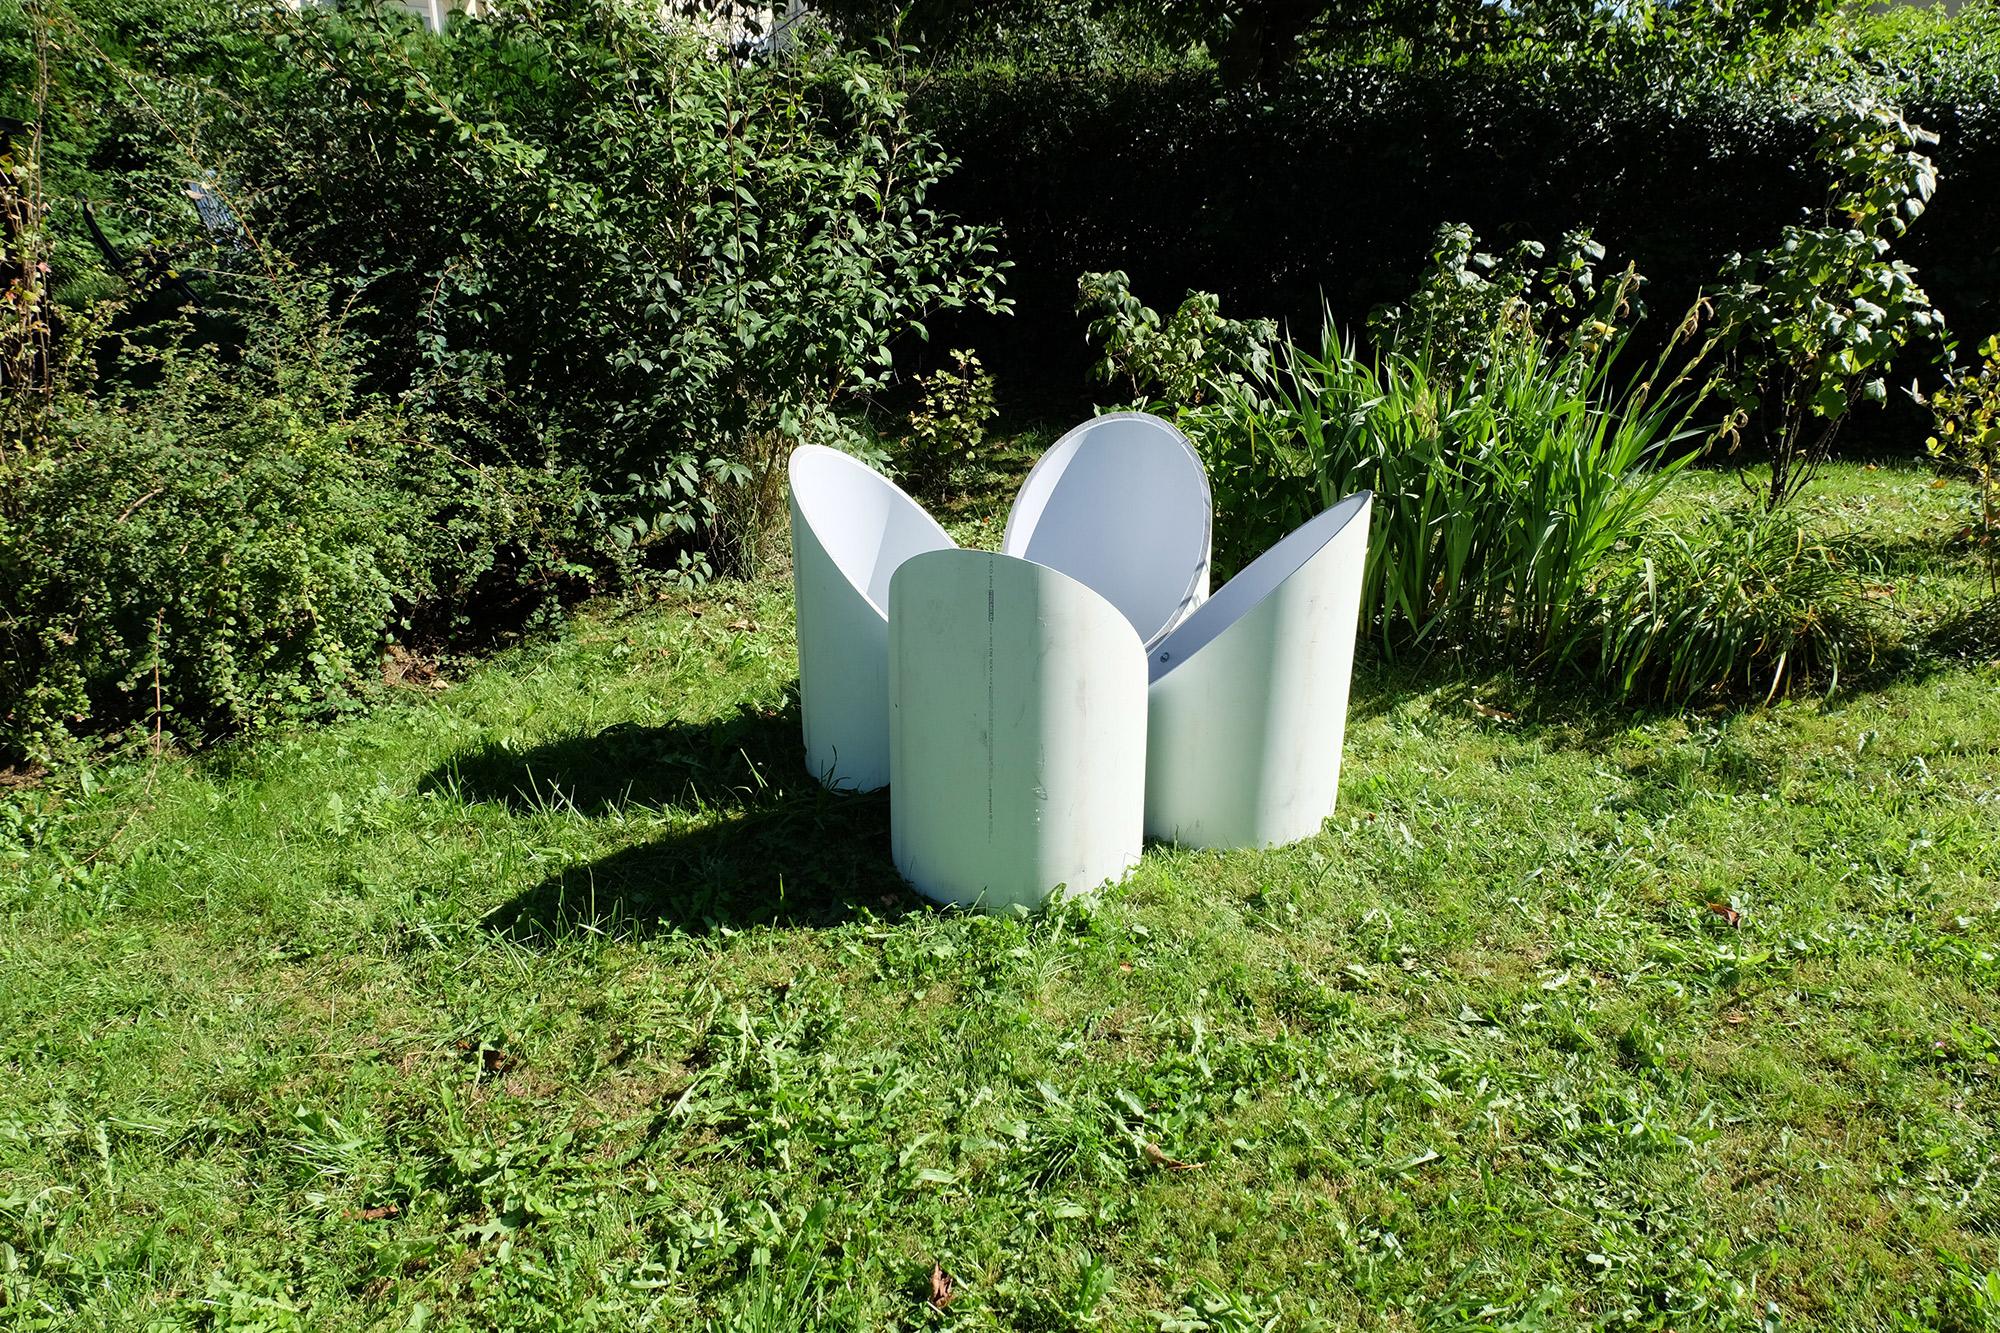 raised-bed-gardening-glass-table-guardians-of-time-manfred-kielnhofer-modern-design-fineart-arts-garden-sculpture-contemporary-art-7950